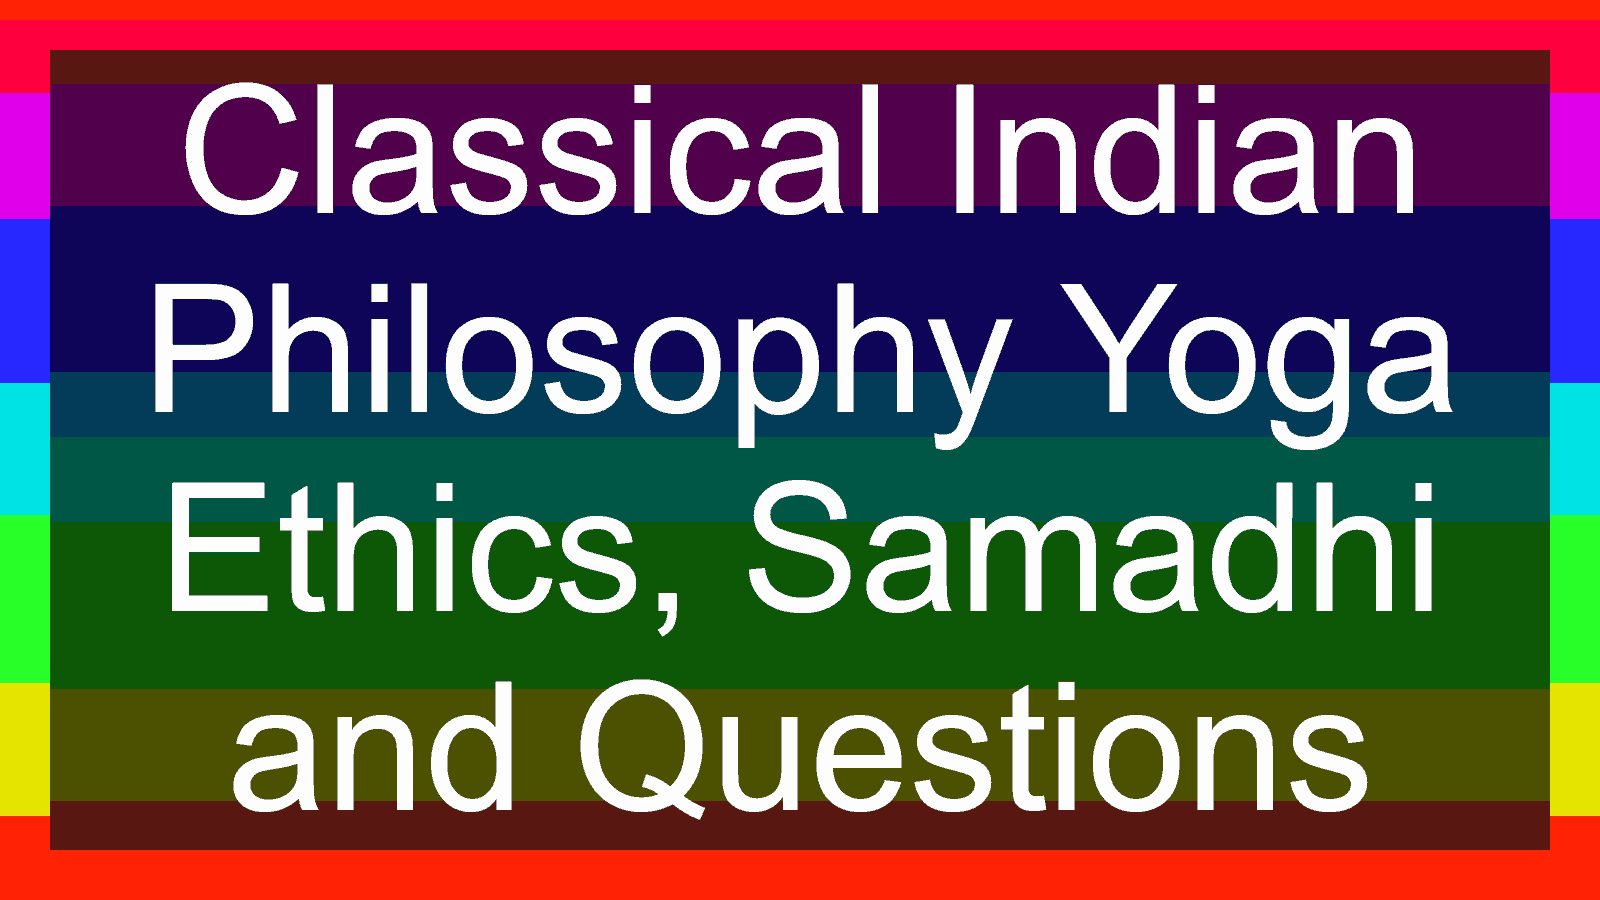 Classical Indian Philosophy Yoga Ethics Samadhi And Questions Examrace